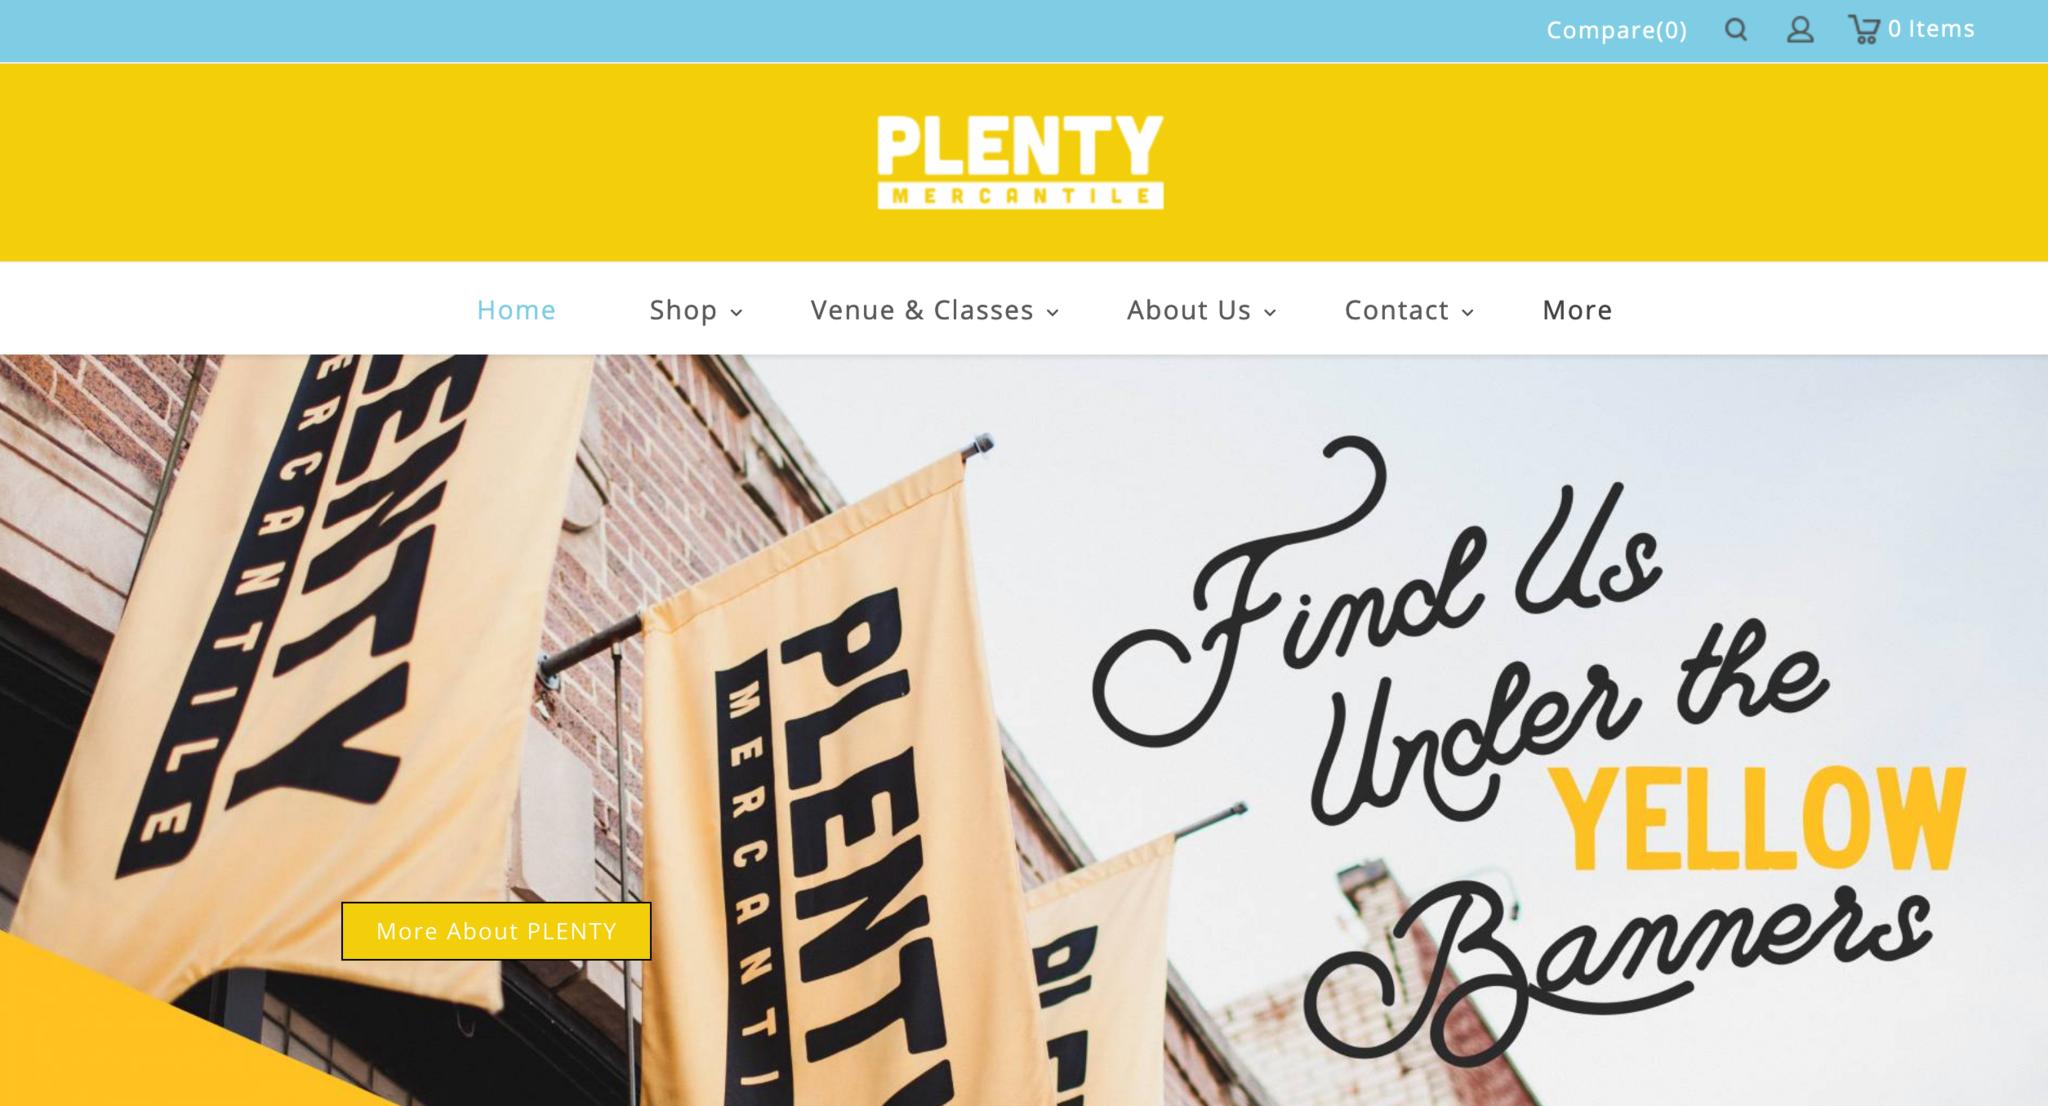 plentymercantile.com